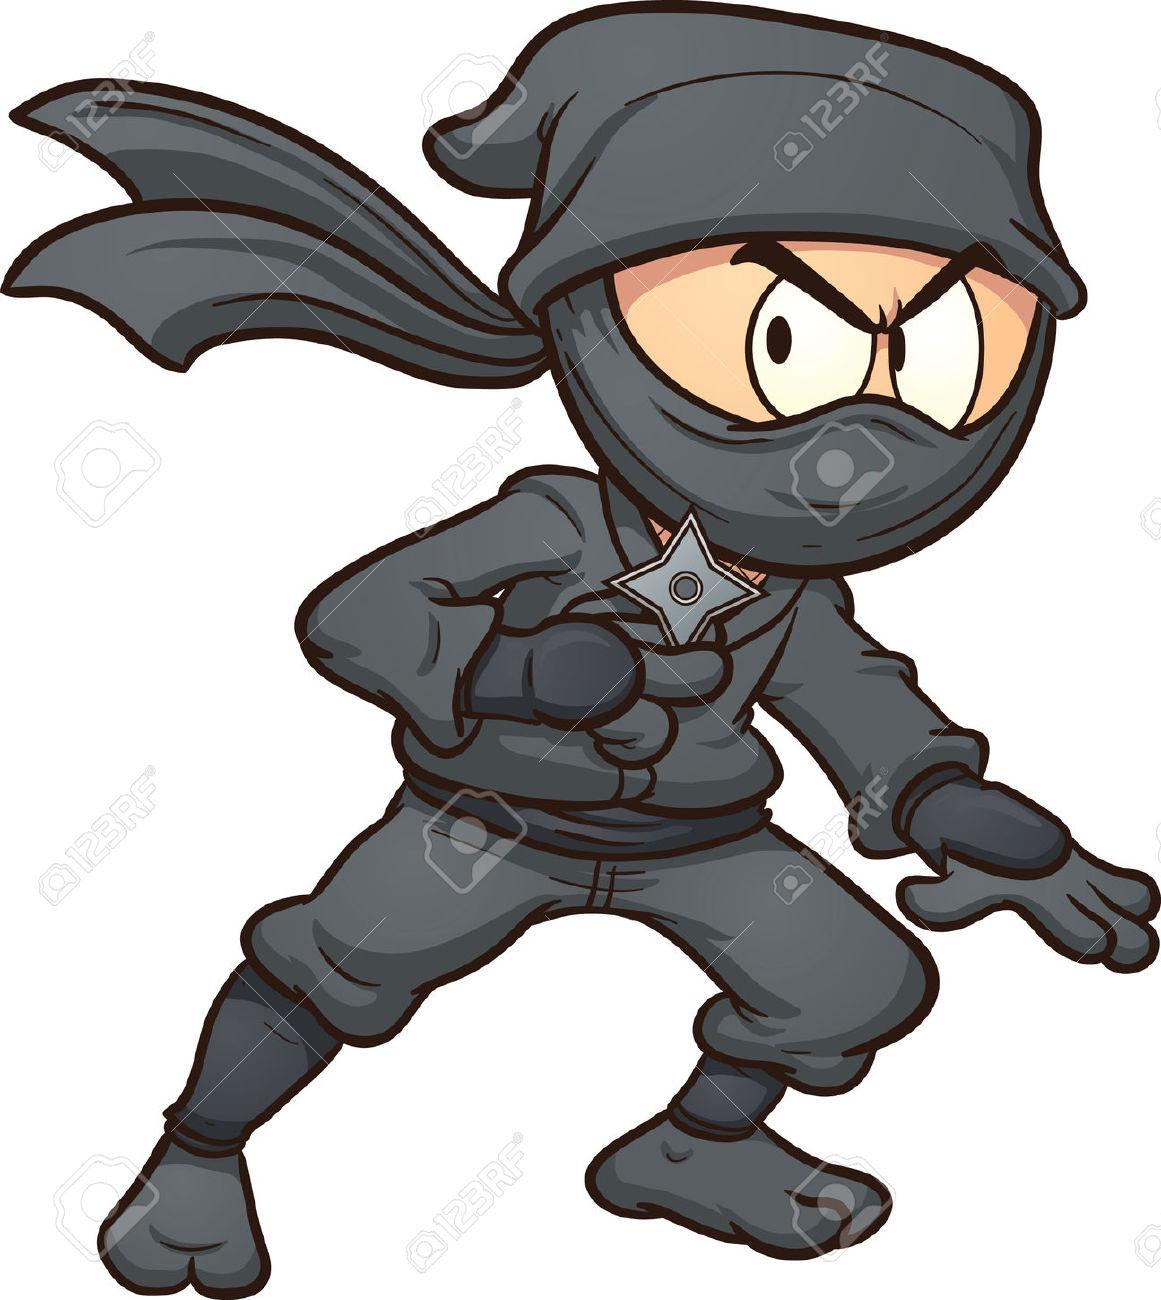 5,966 Ninja Stock Vector Illustration And Royalty Free Ninja Clipart.